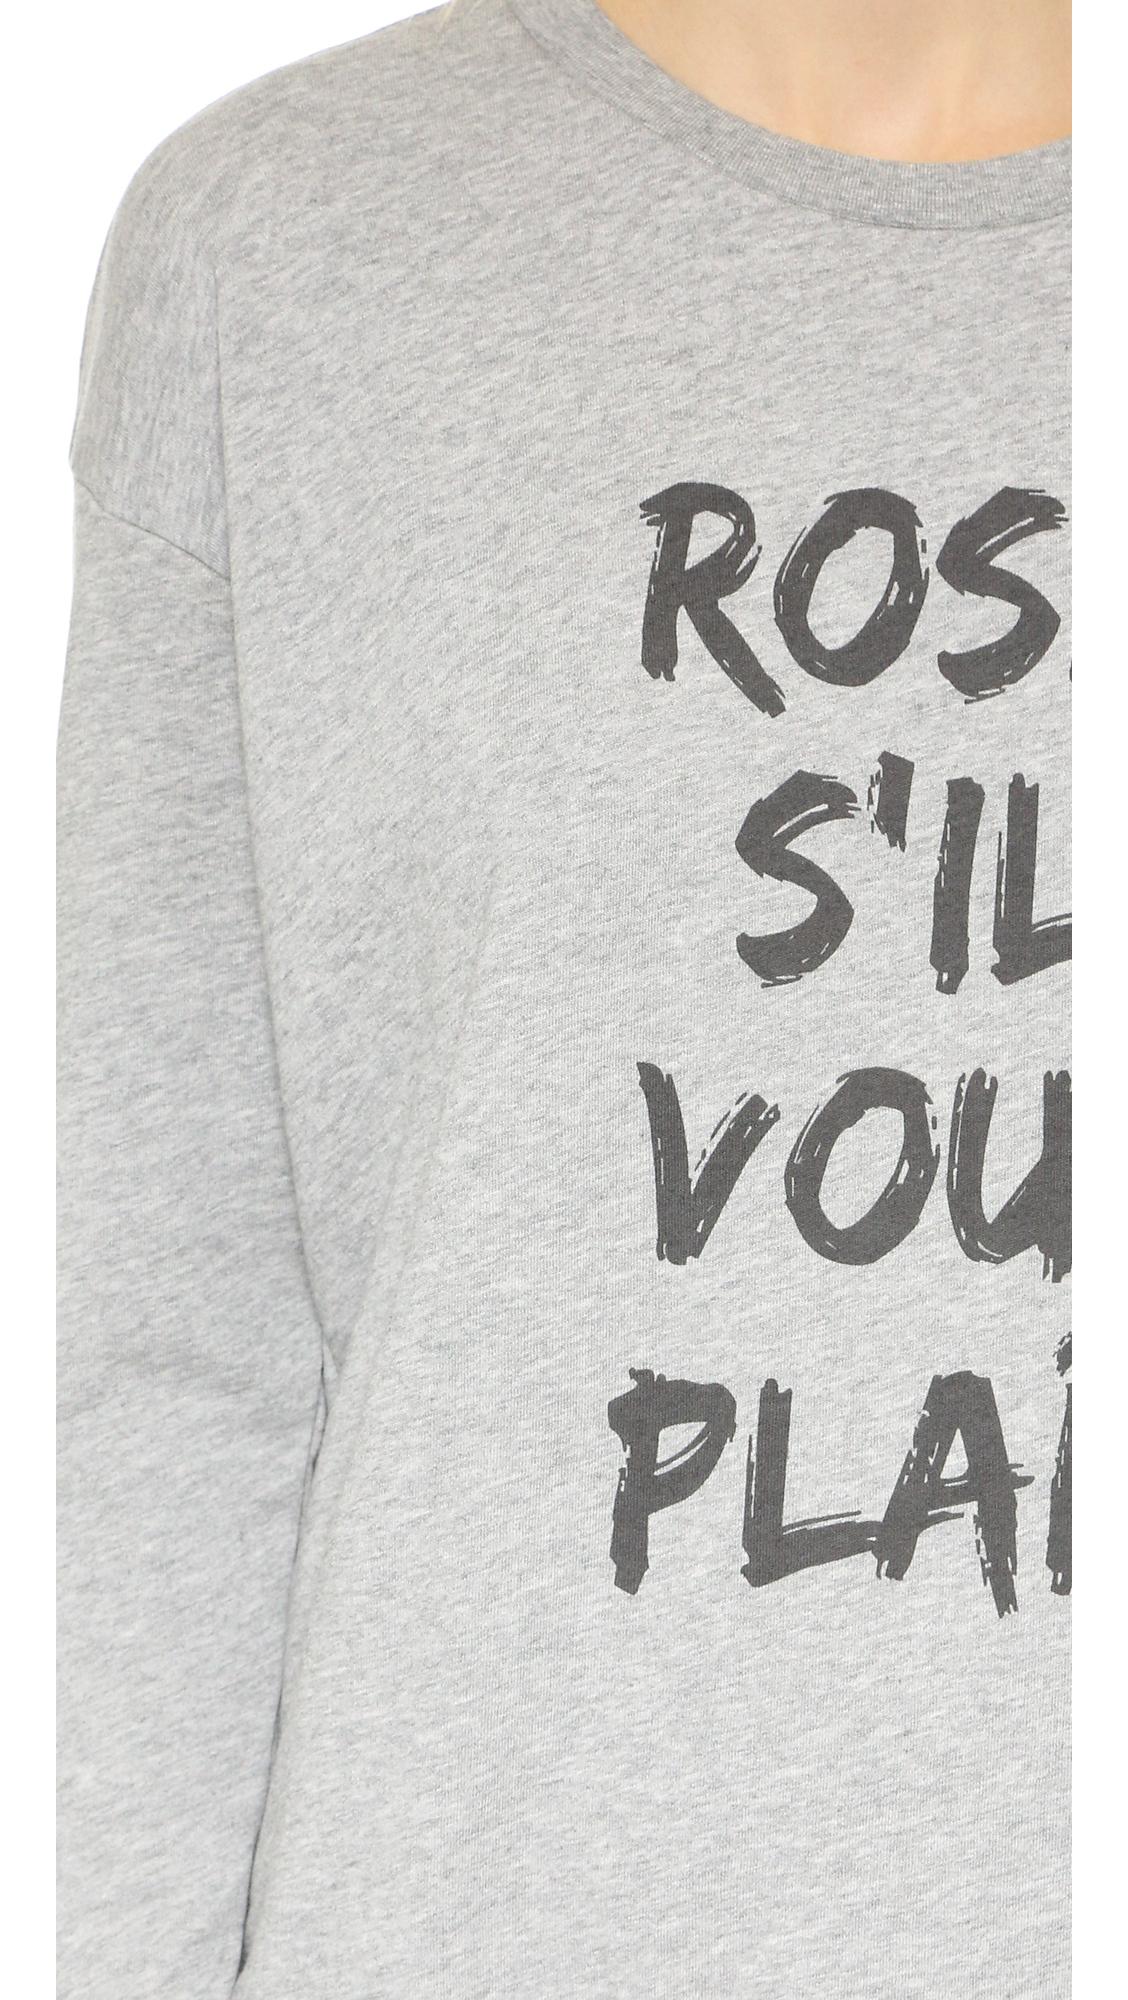 south parade rose s 39 il vous plait sweatshirt in gray lyst. Black Bedroom Furniture Sets. Home Design Ideas